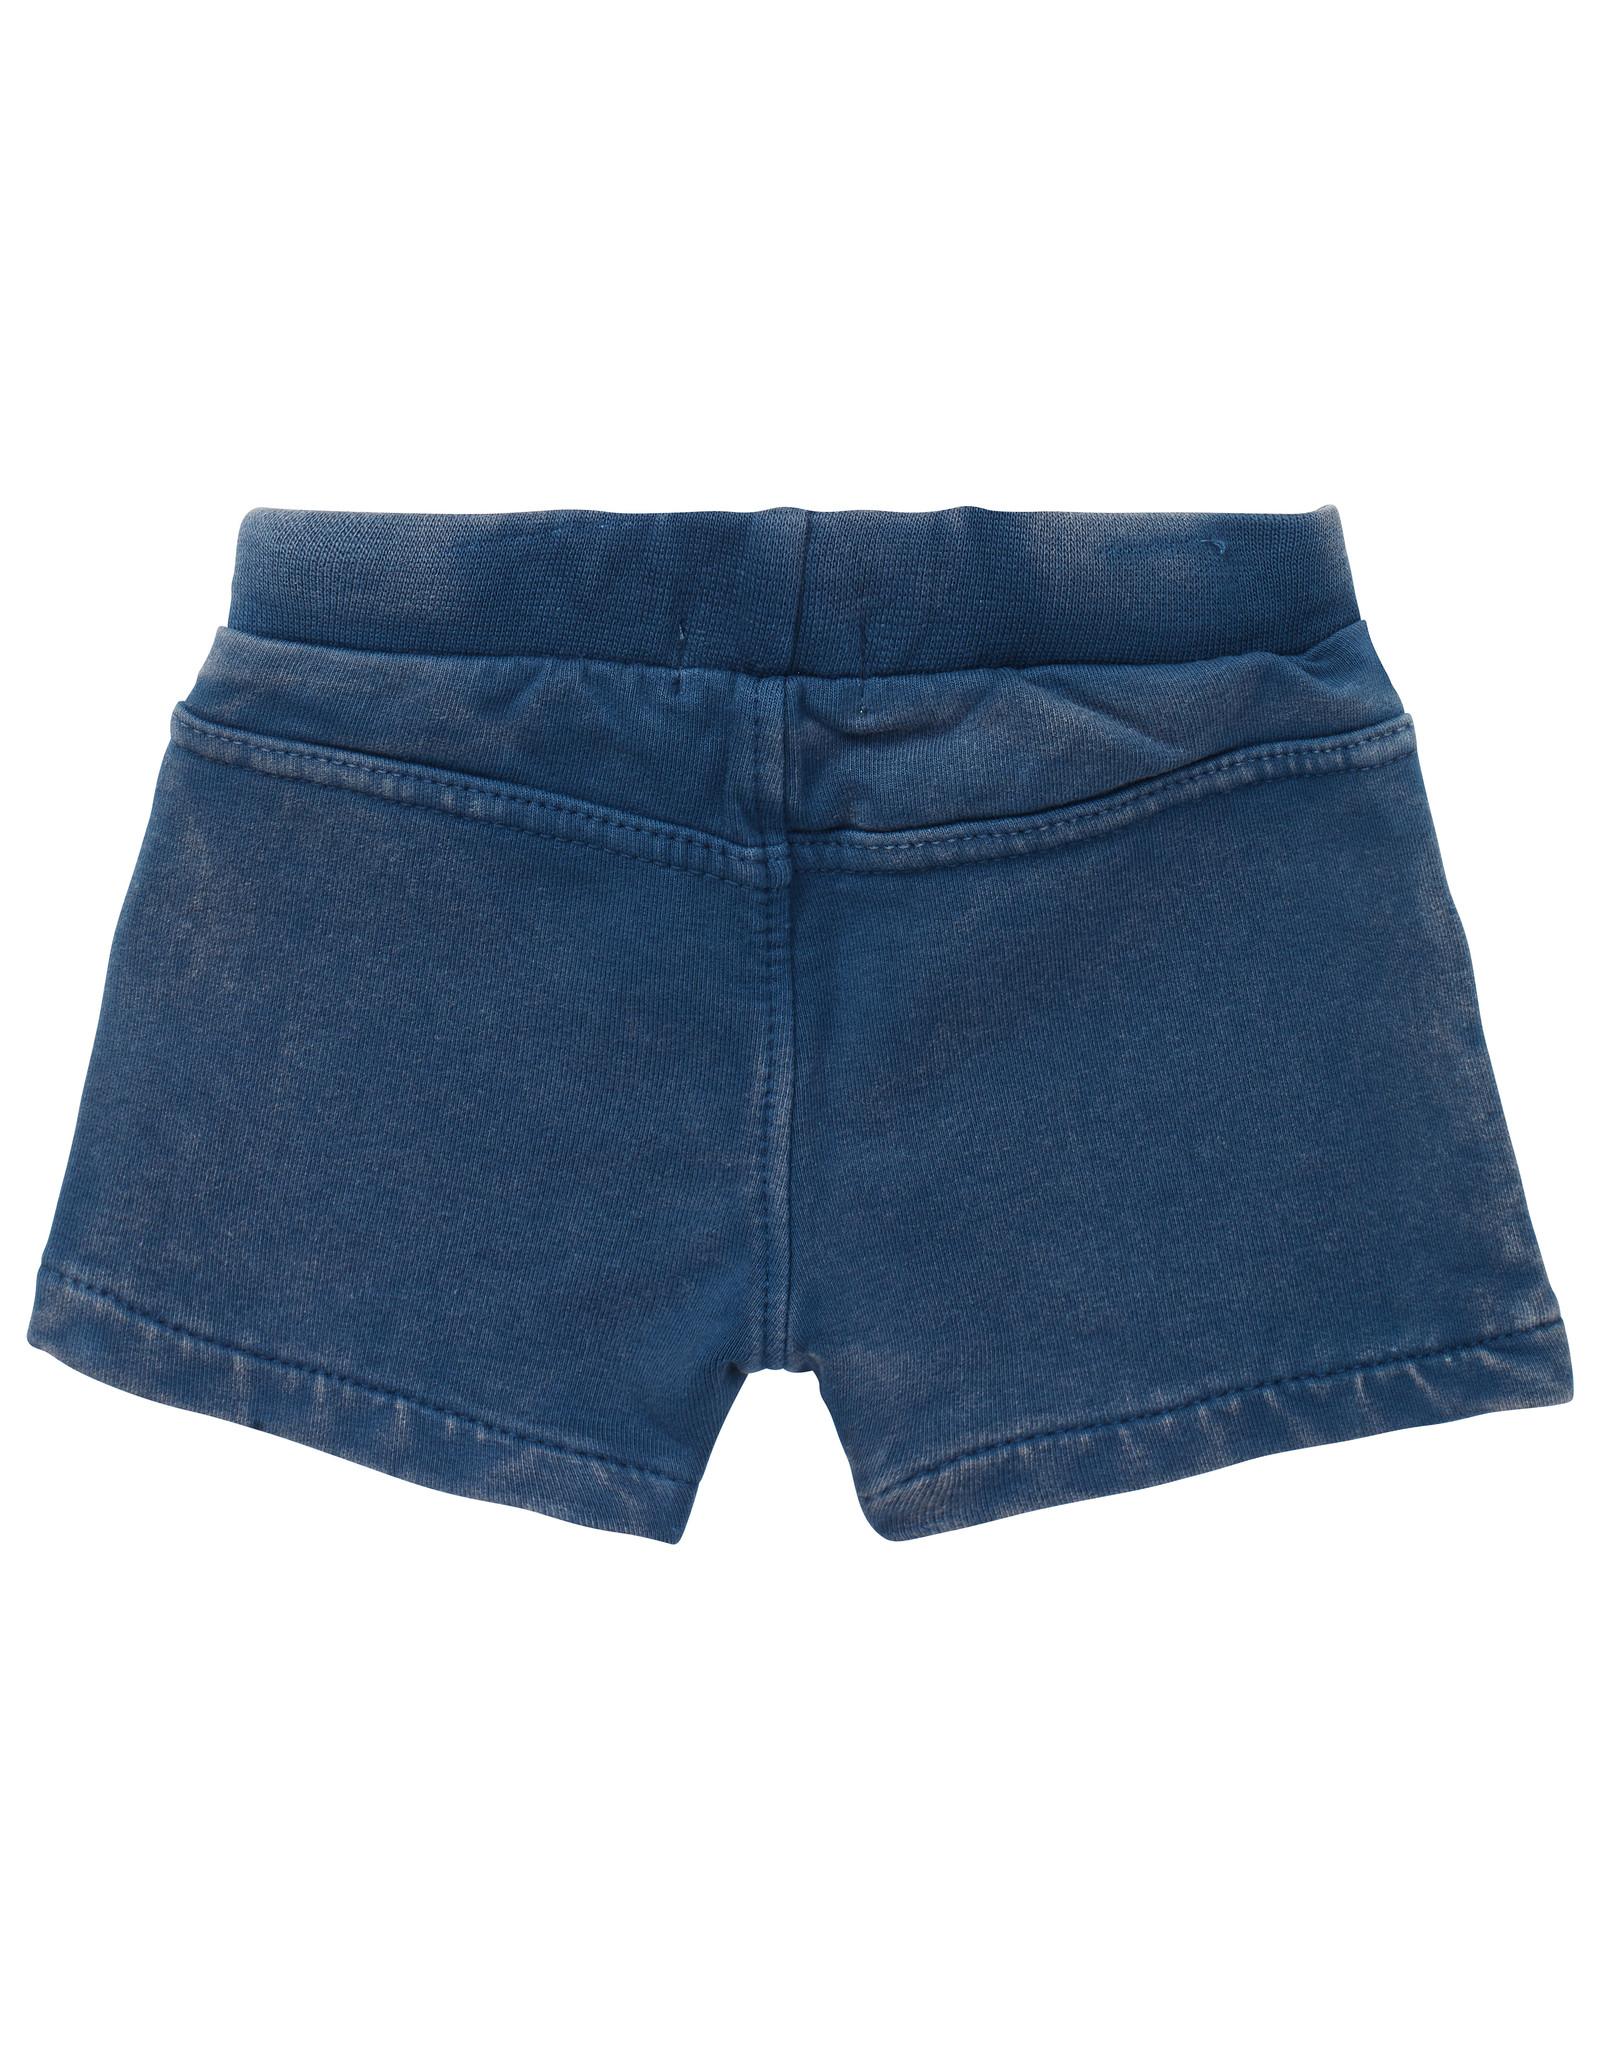 Noppies B Short non denim knit Terrebonne, Ensign Blue